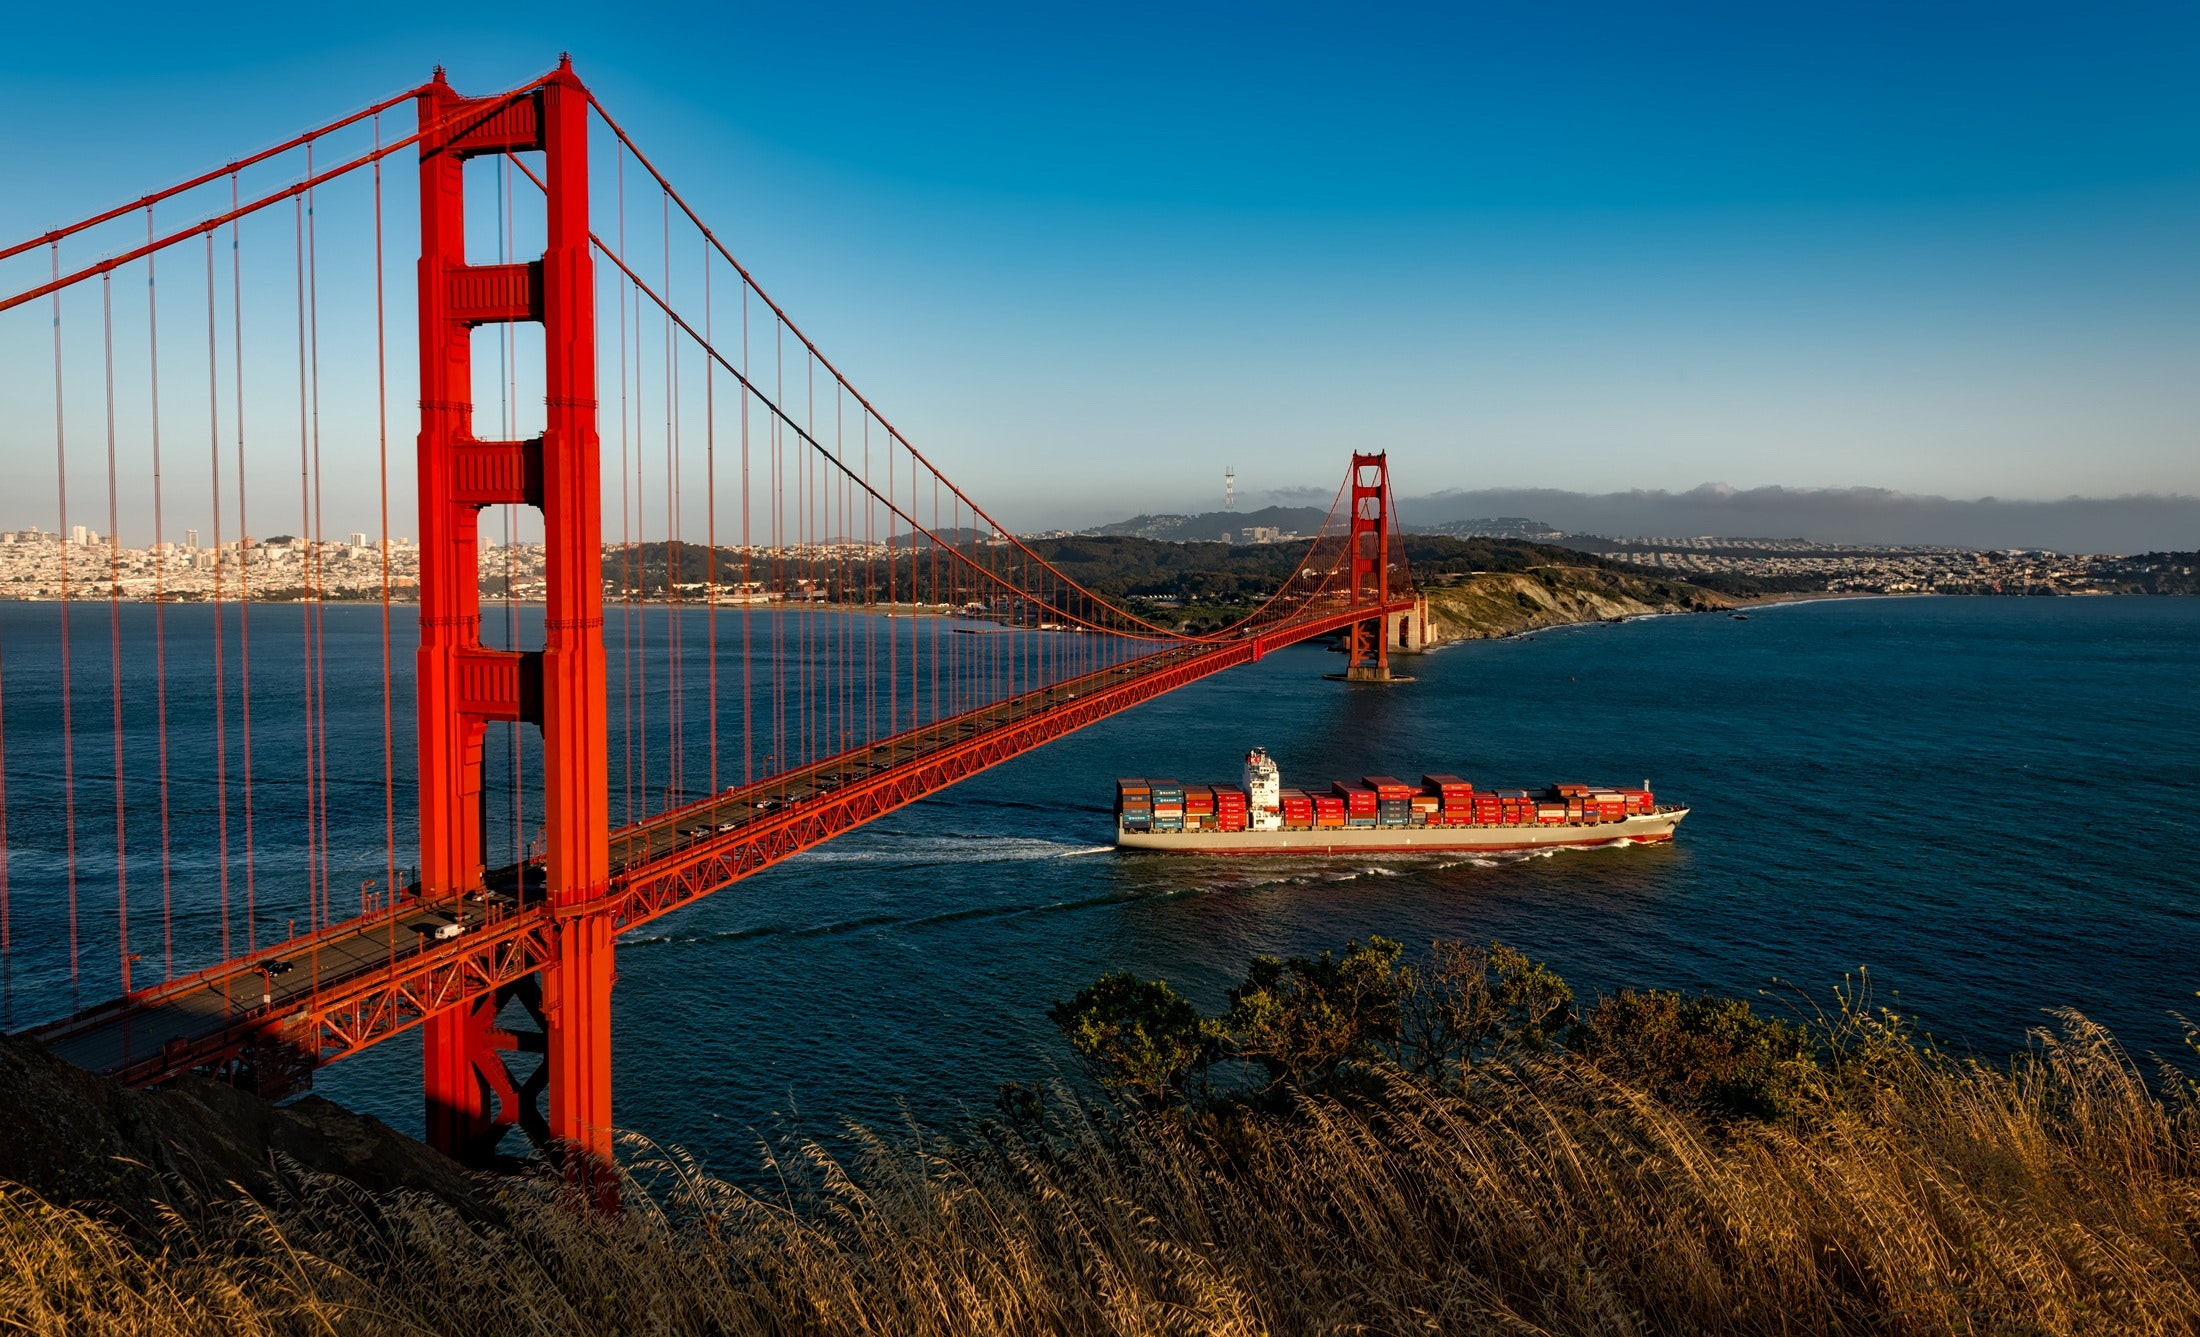 Golden Gate Bridge in San Francisco HD Wallpaper